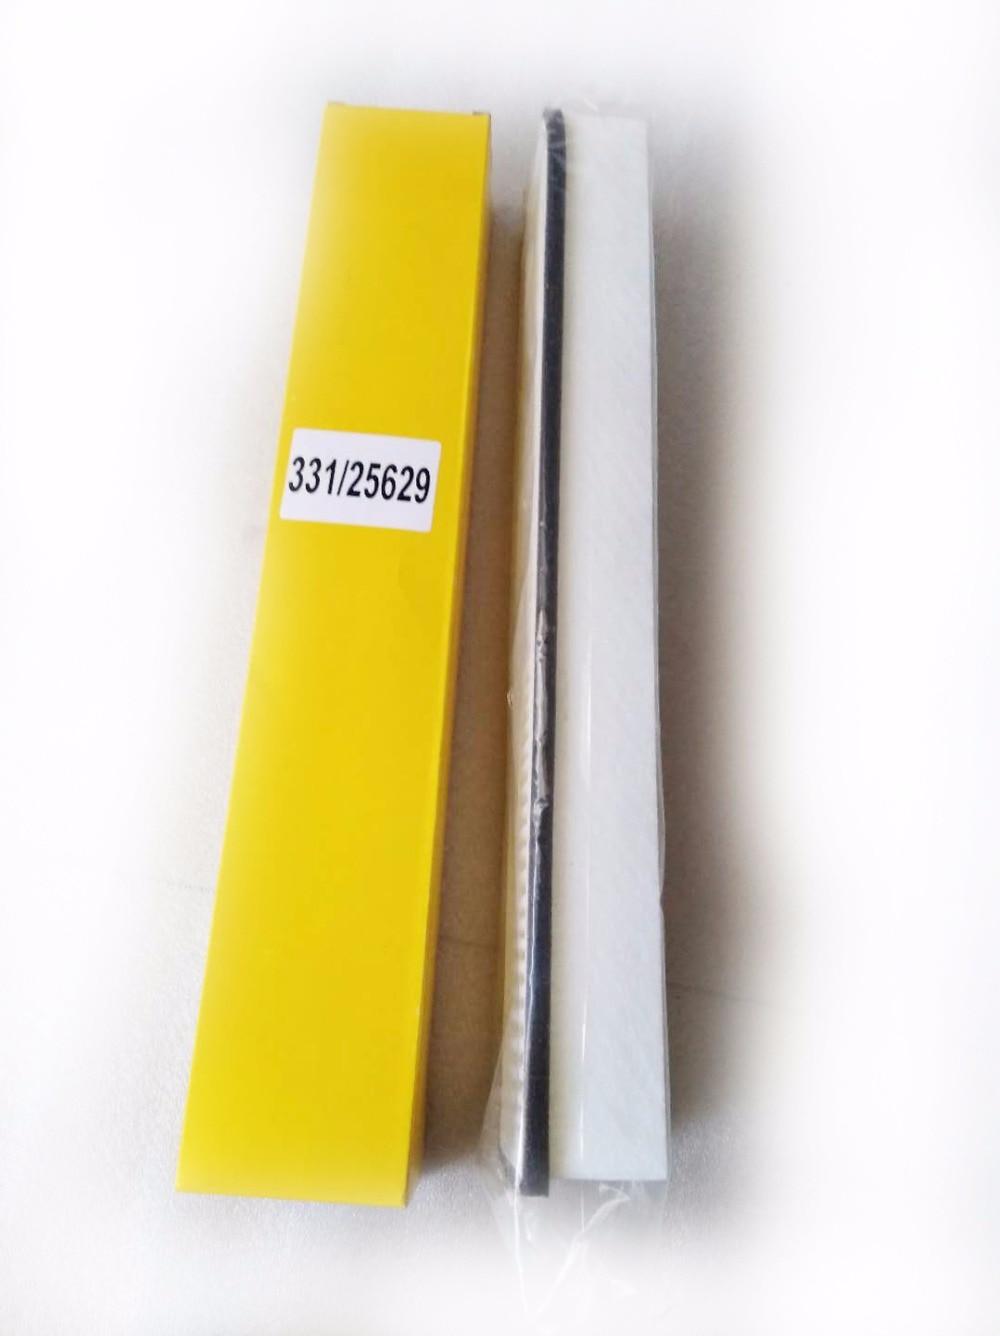 331-256295